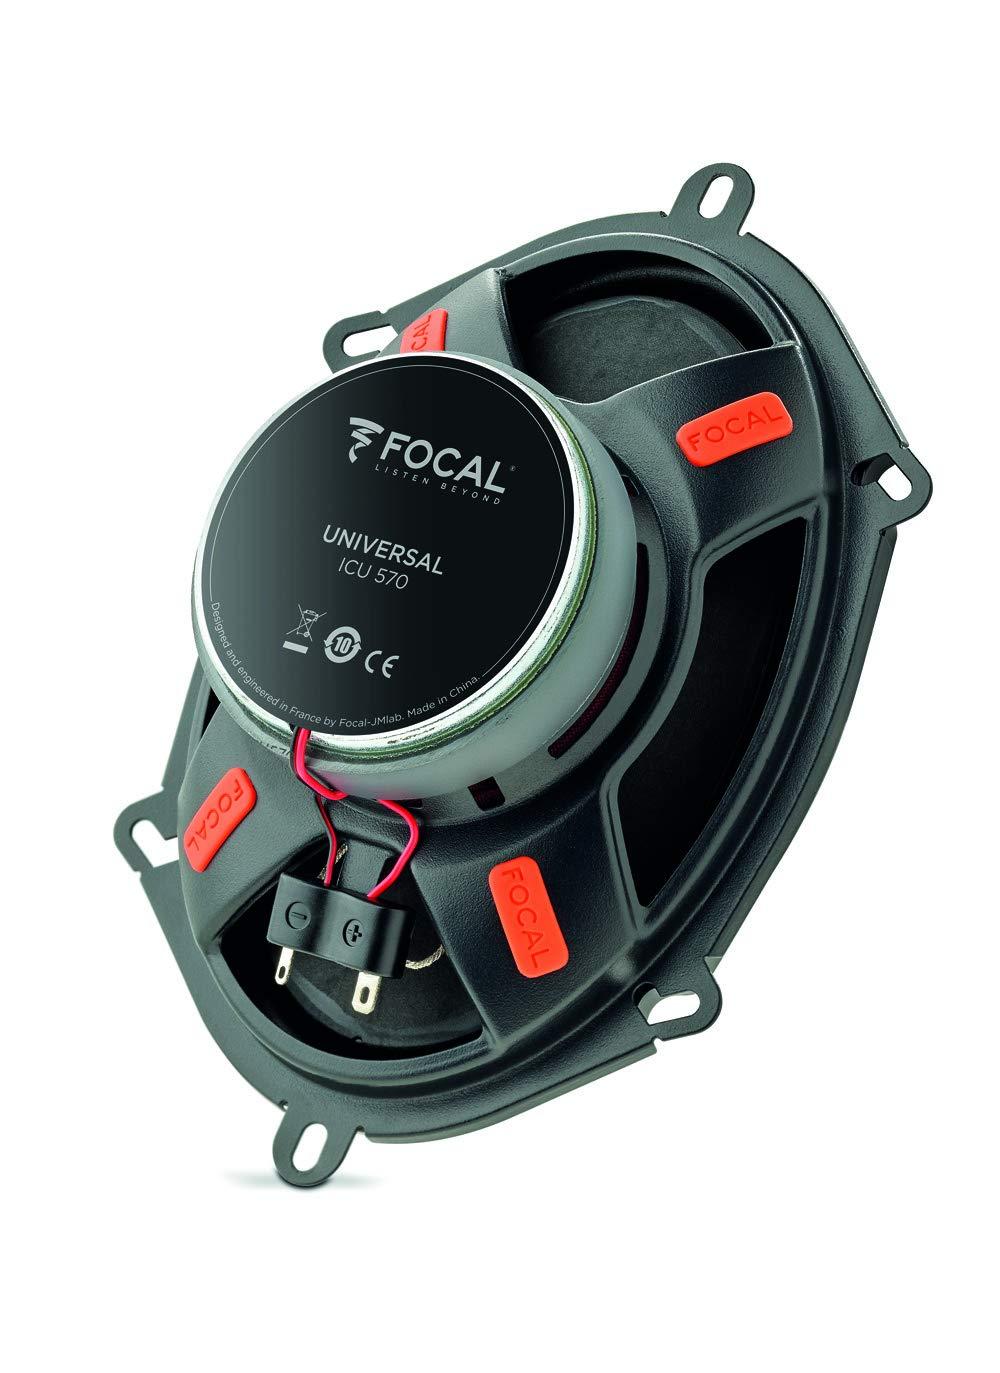 2 St/ück Focal ICU570 Integration 2-Wege Coax 13 x 18 cm 1 Paar